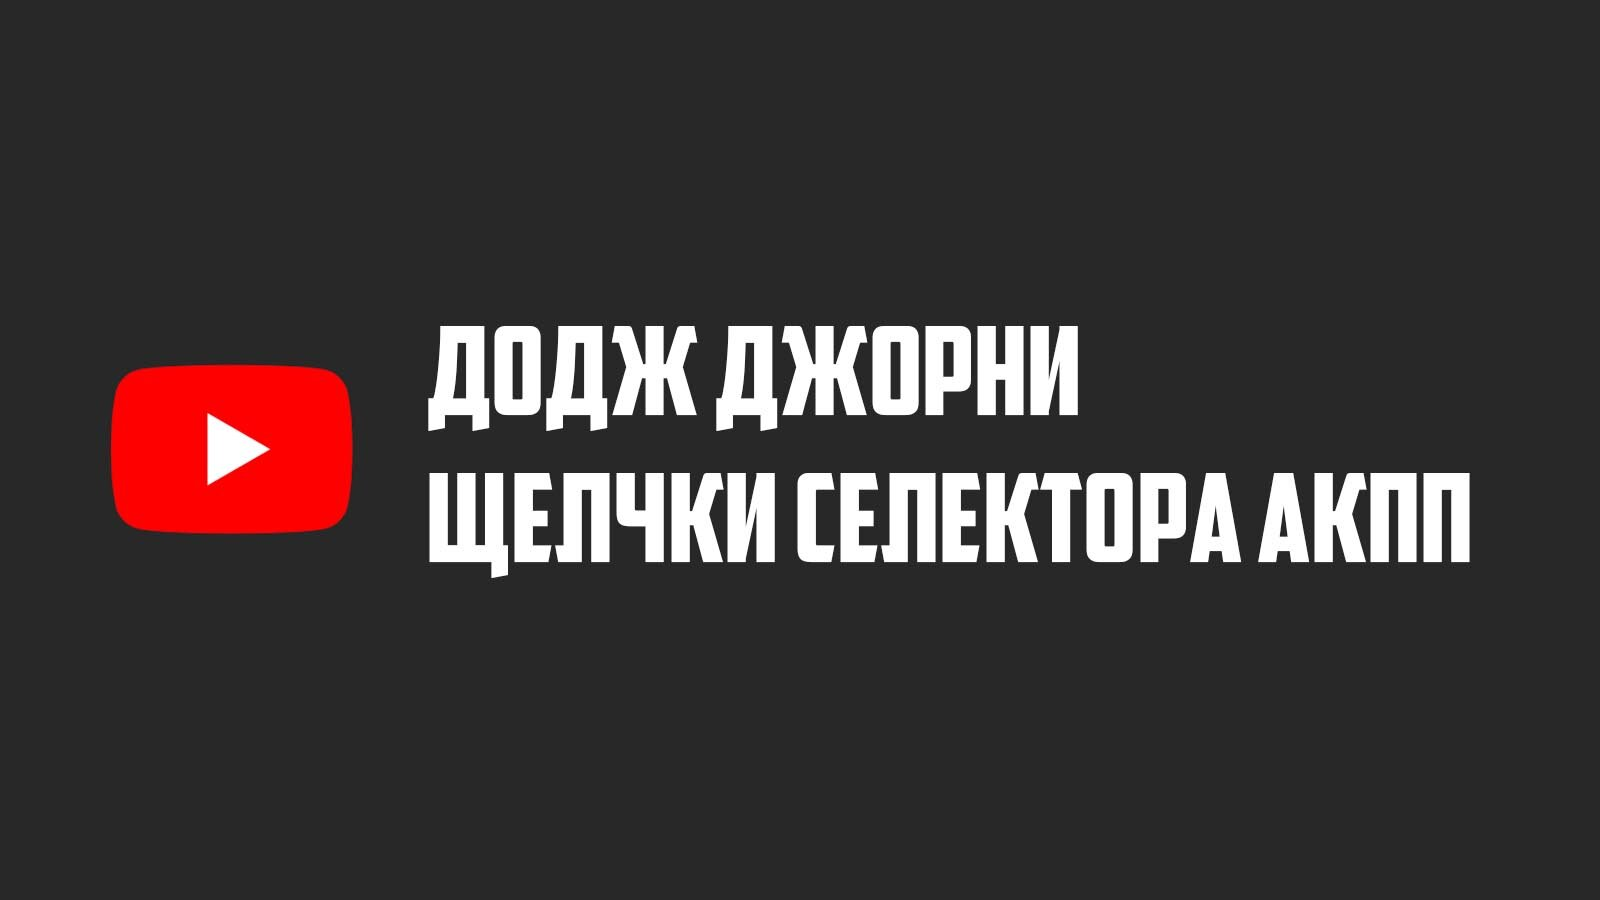 Щелчки селектора АКПП Додж Джорни